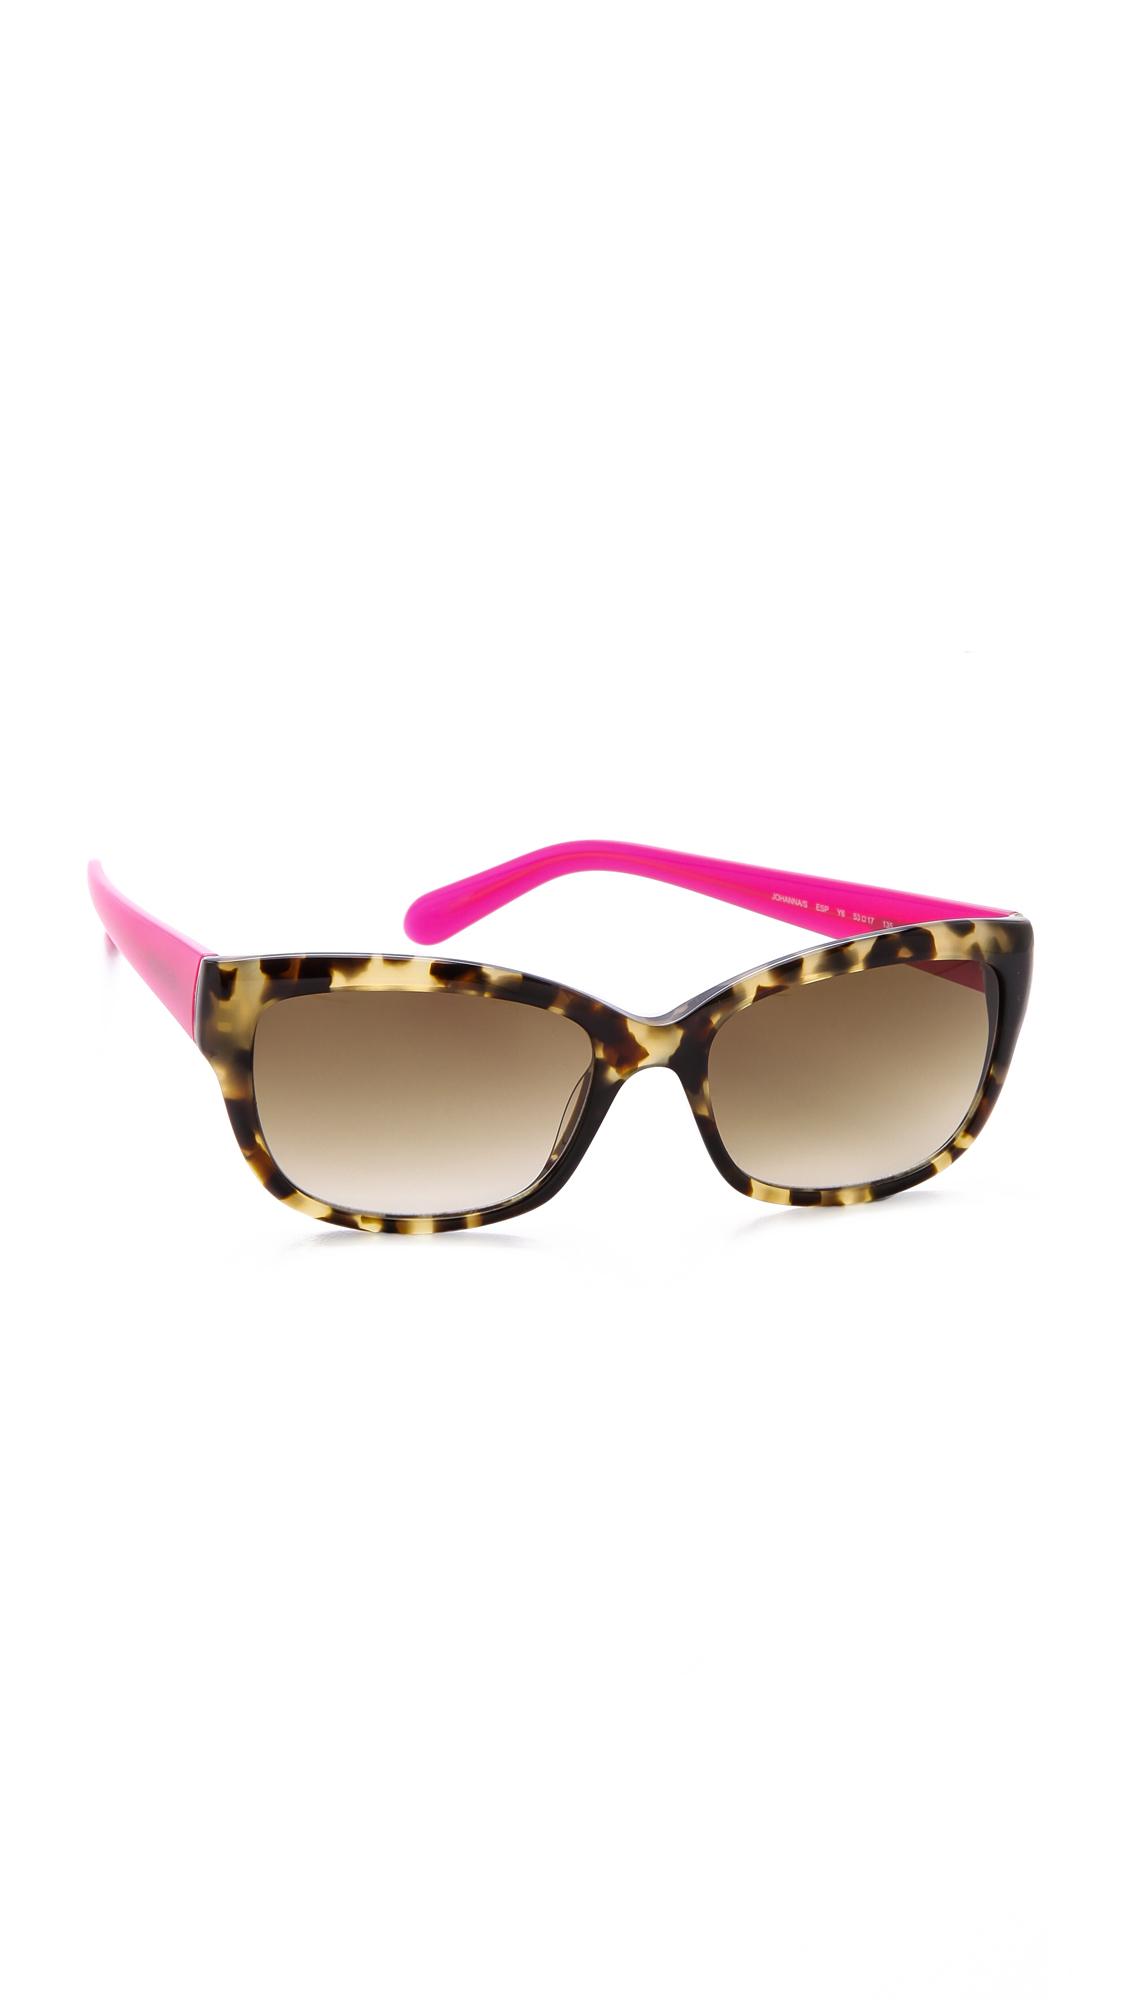 7384923f877 Lyst - Kate Spade Johanna Sunglasses in Pink